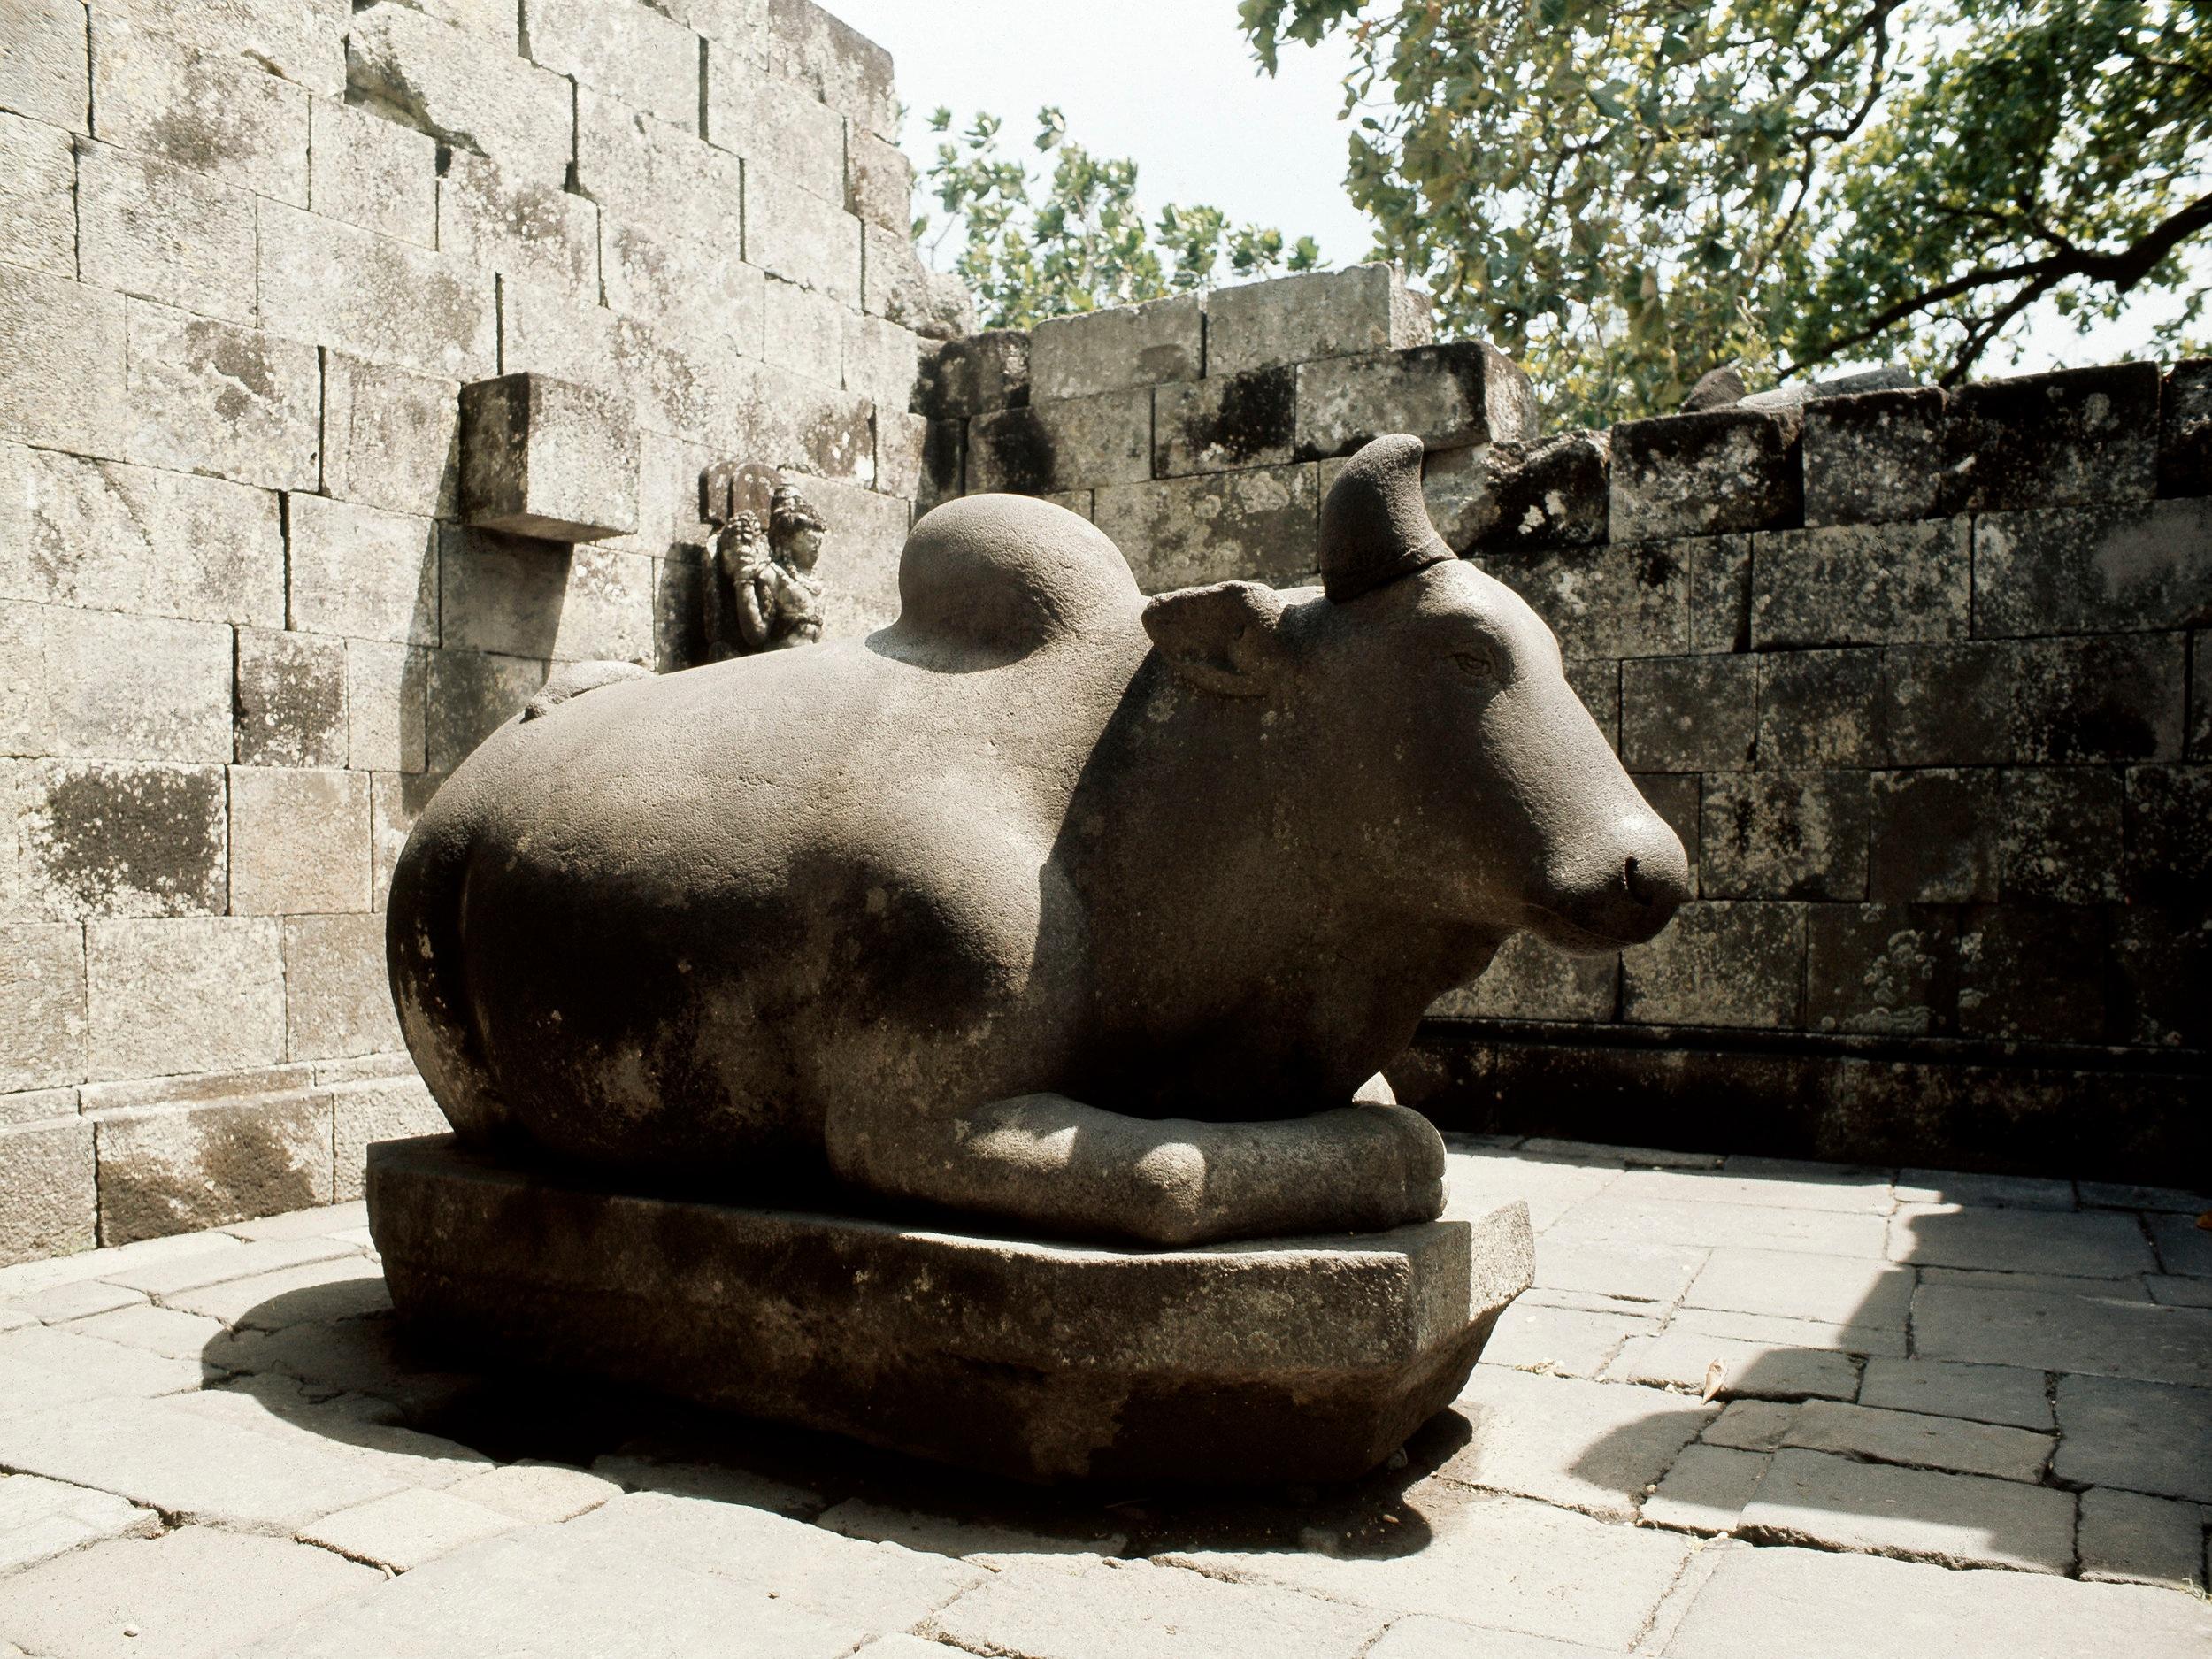 Nandi, the bull mount of Shiva, at the temple of the Lara Jonggrang complex. Country of Origin: Java, Indonesia. Culture: Hindu. Date/Period: c 900-930 AD. Place of Origin: Prambanan. Credit Line: Werner Forman Archive.